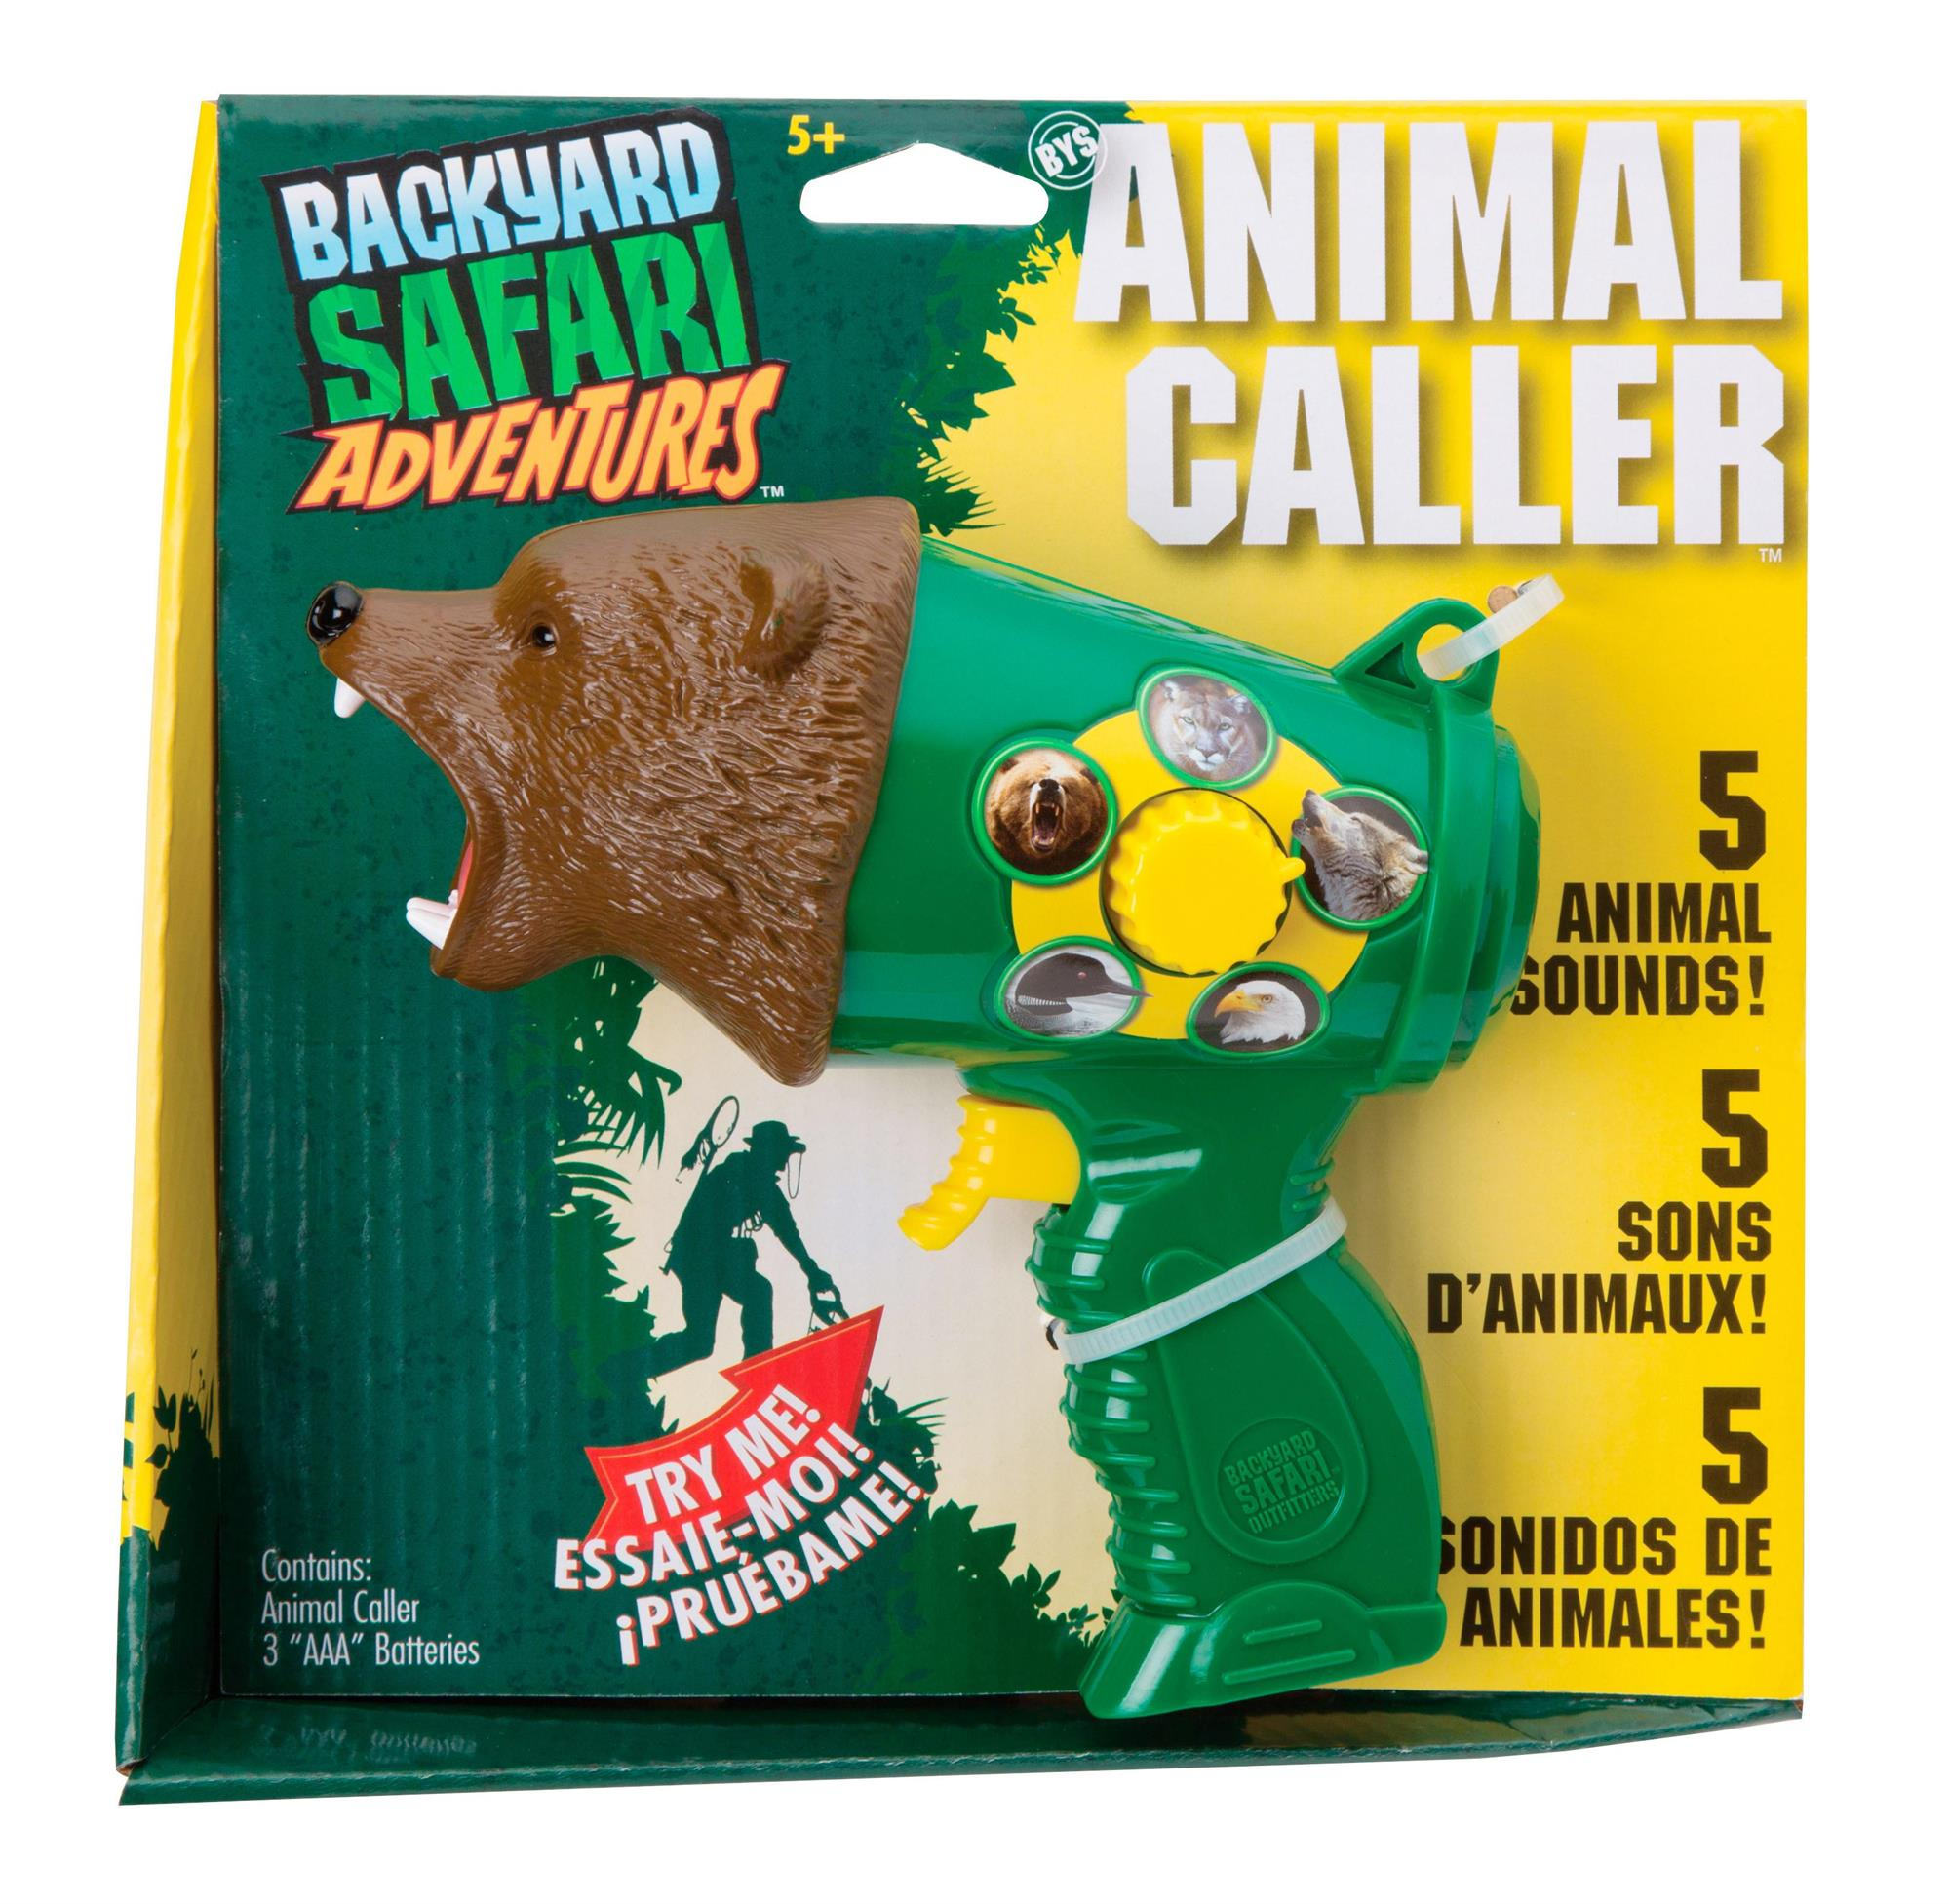 Backyard Safari Adventures Animal Caller